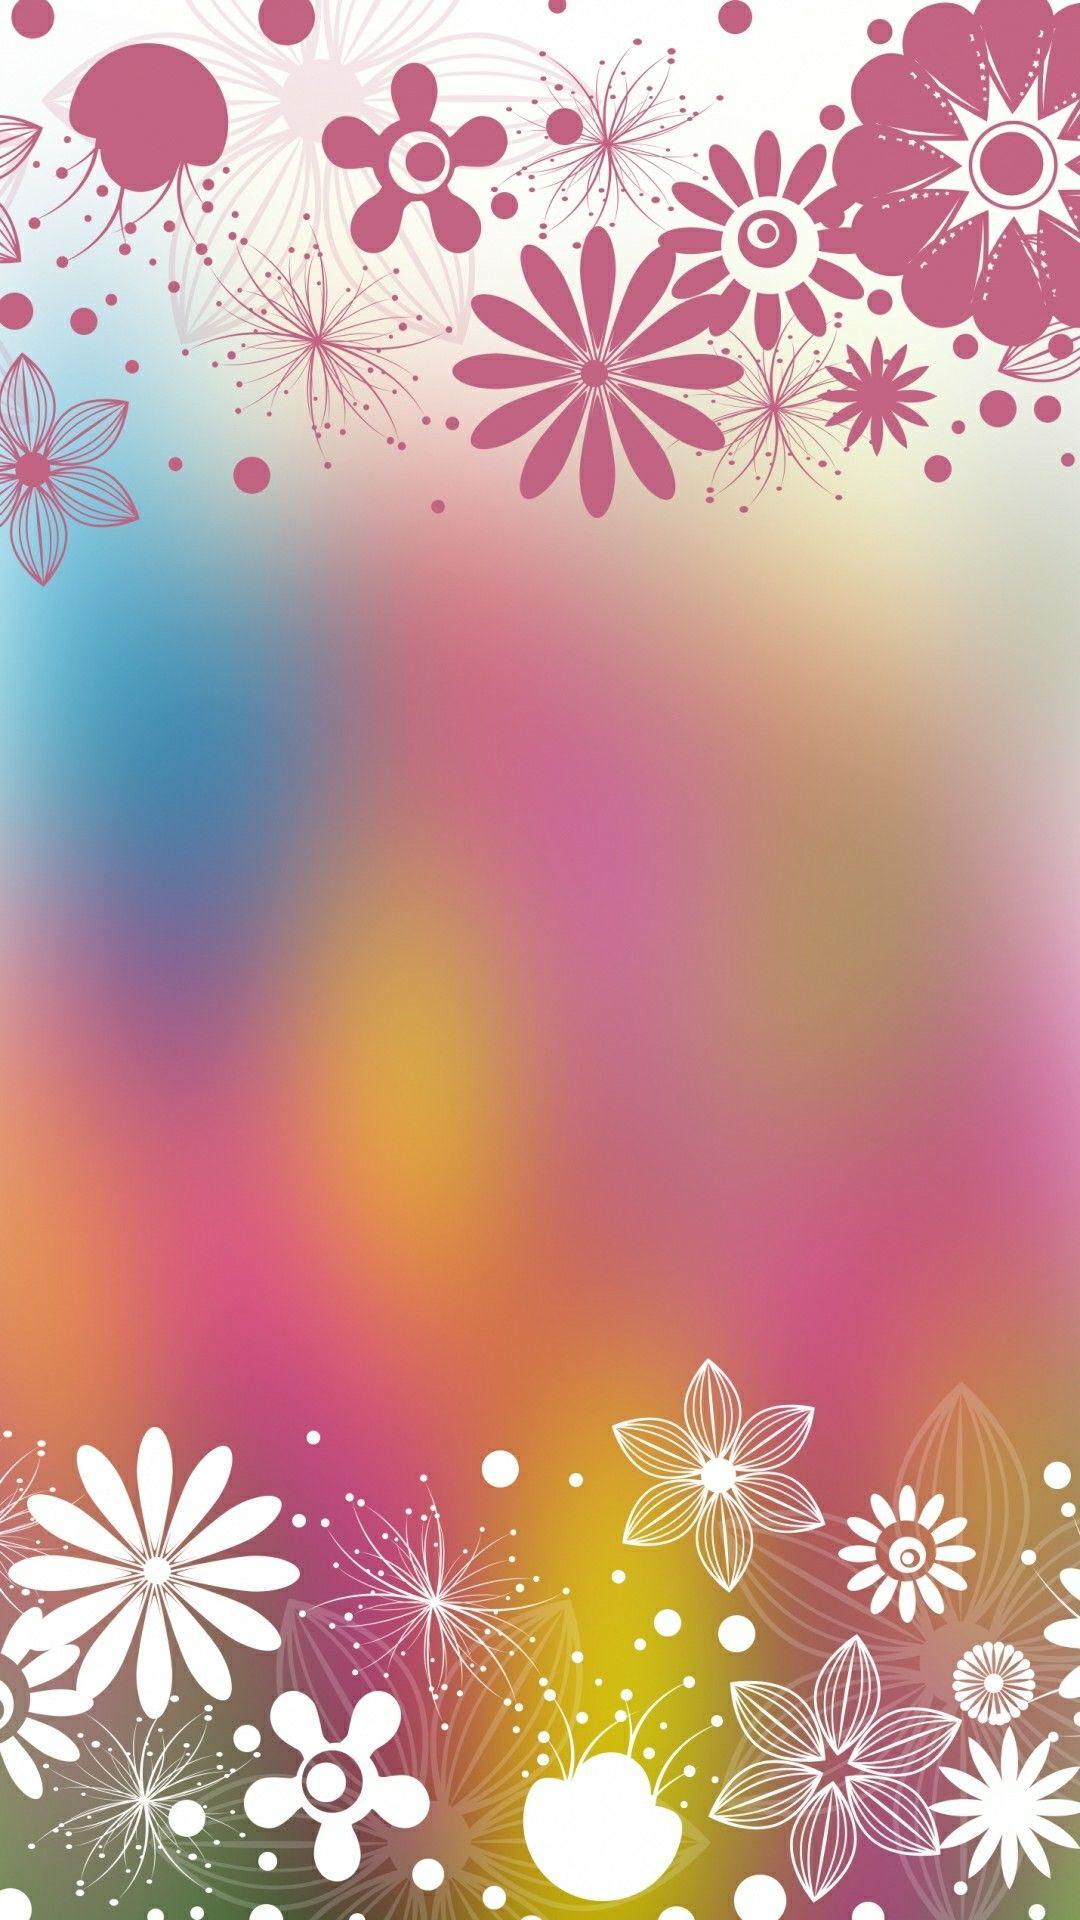 Pin by Joyce Hermosillo on Wallpaper/ Decoupage/Holiday